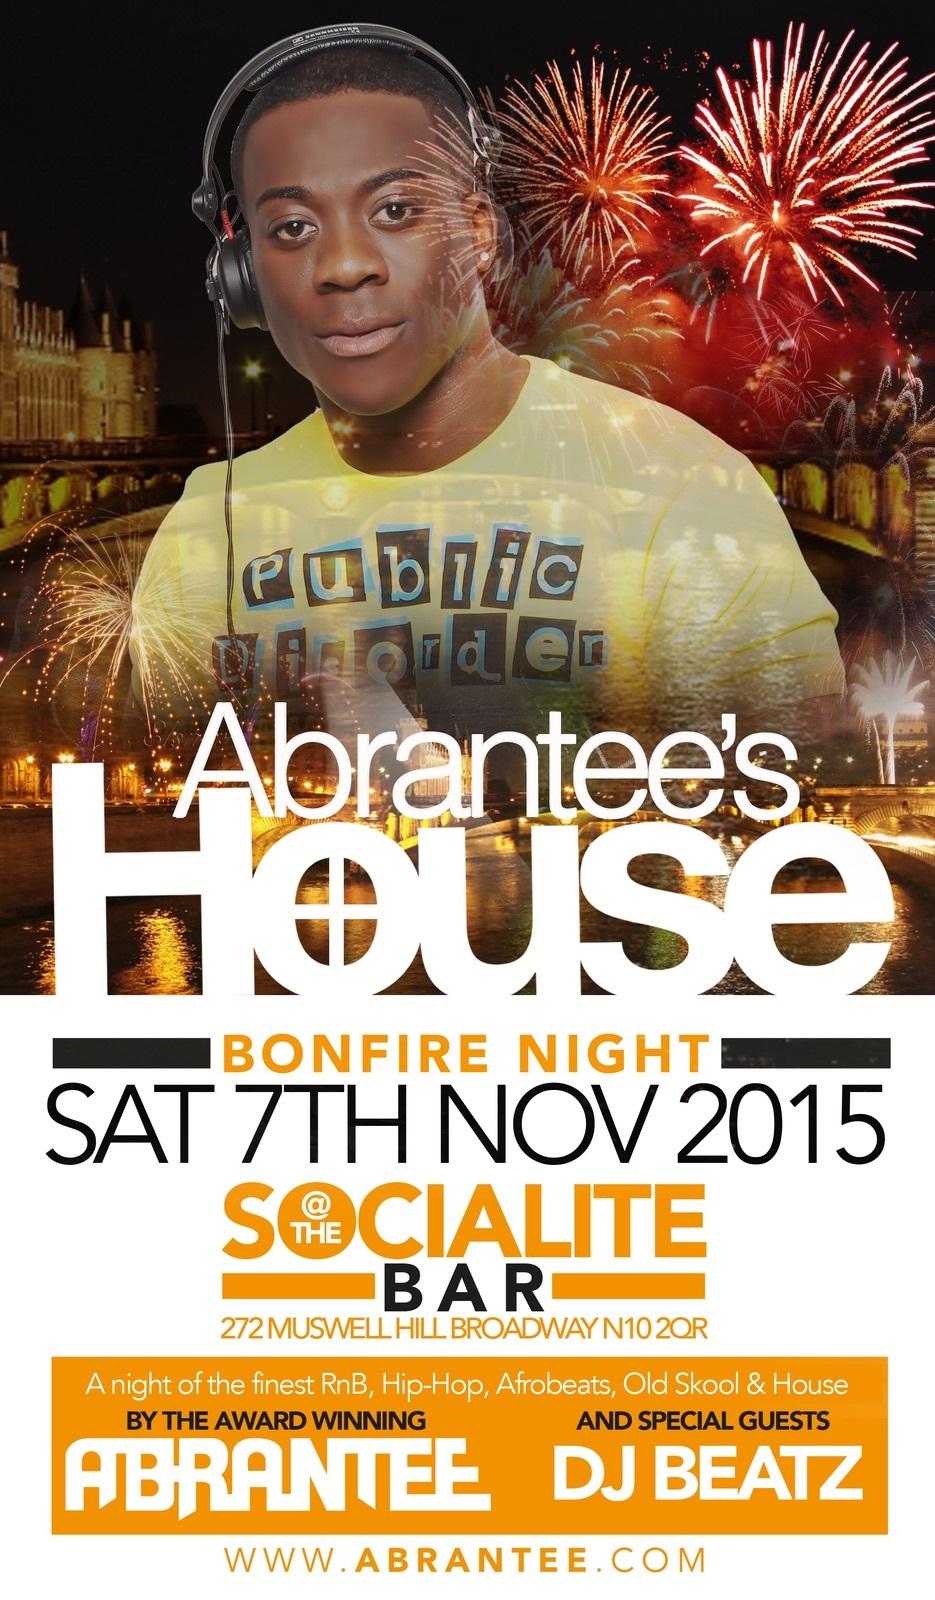 Abrantee's House Bonfire Night special